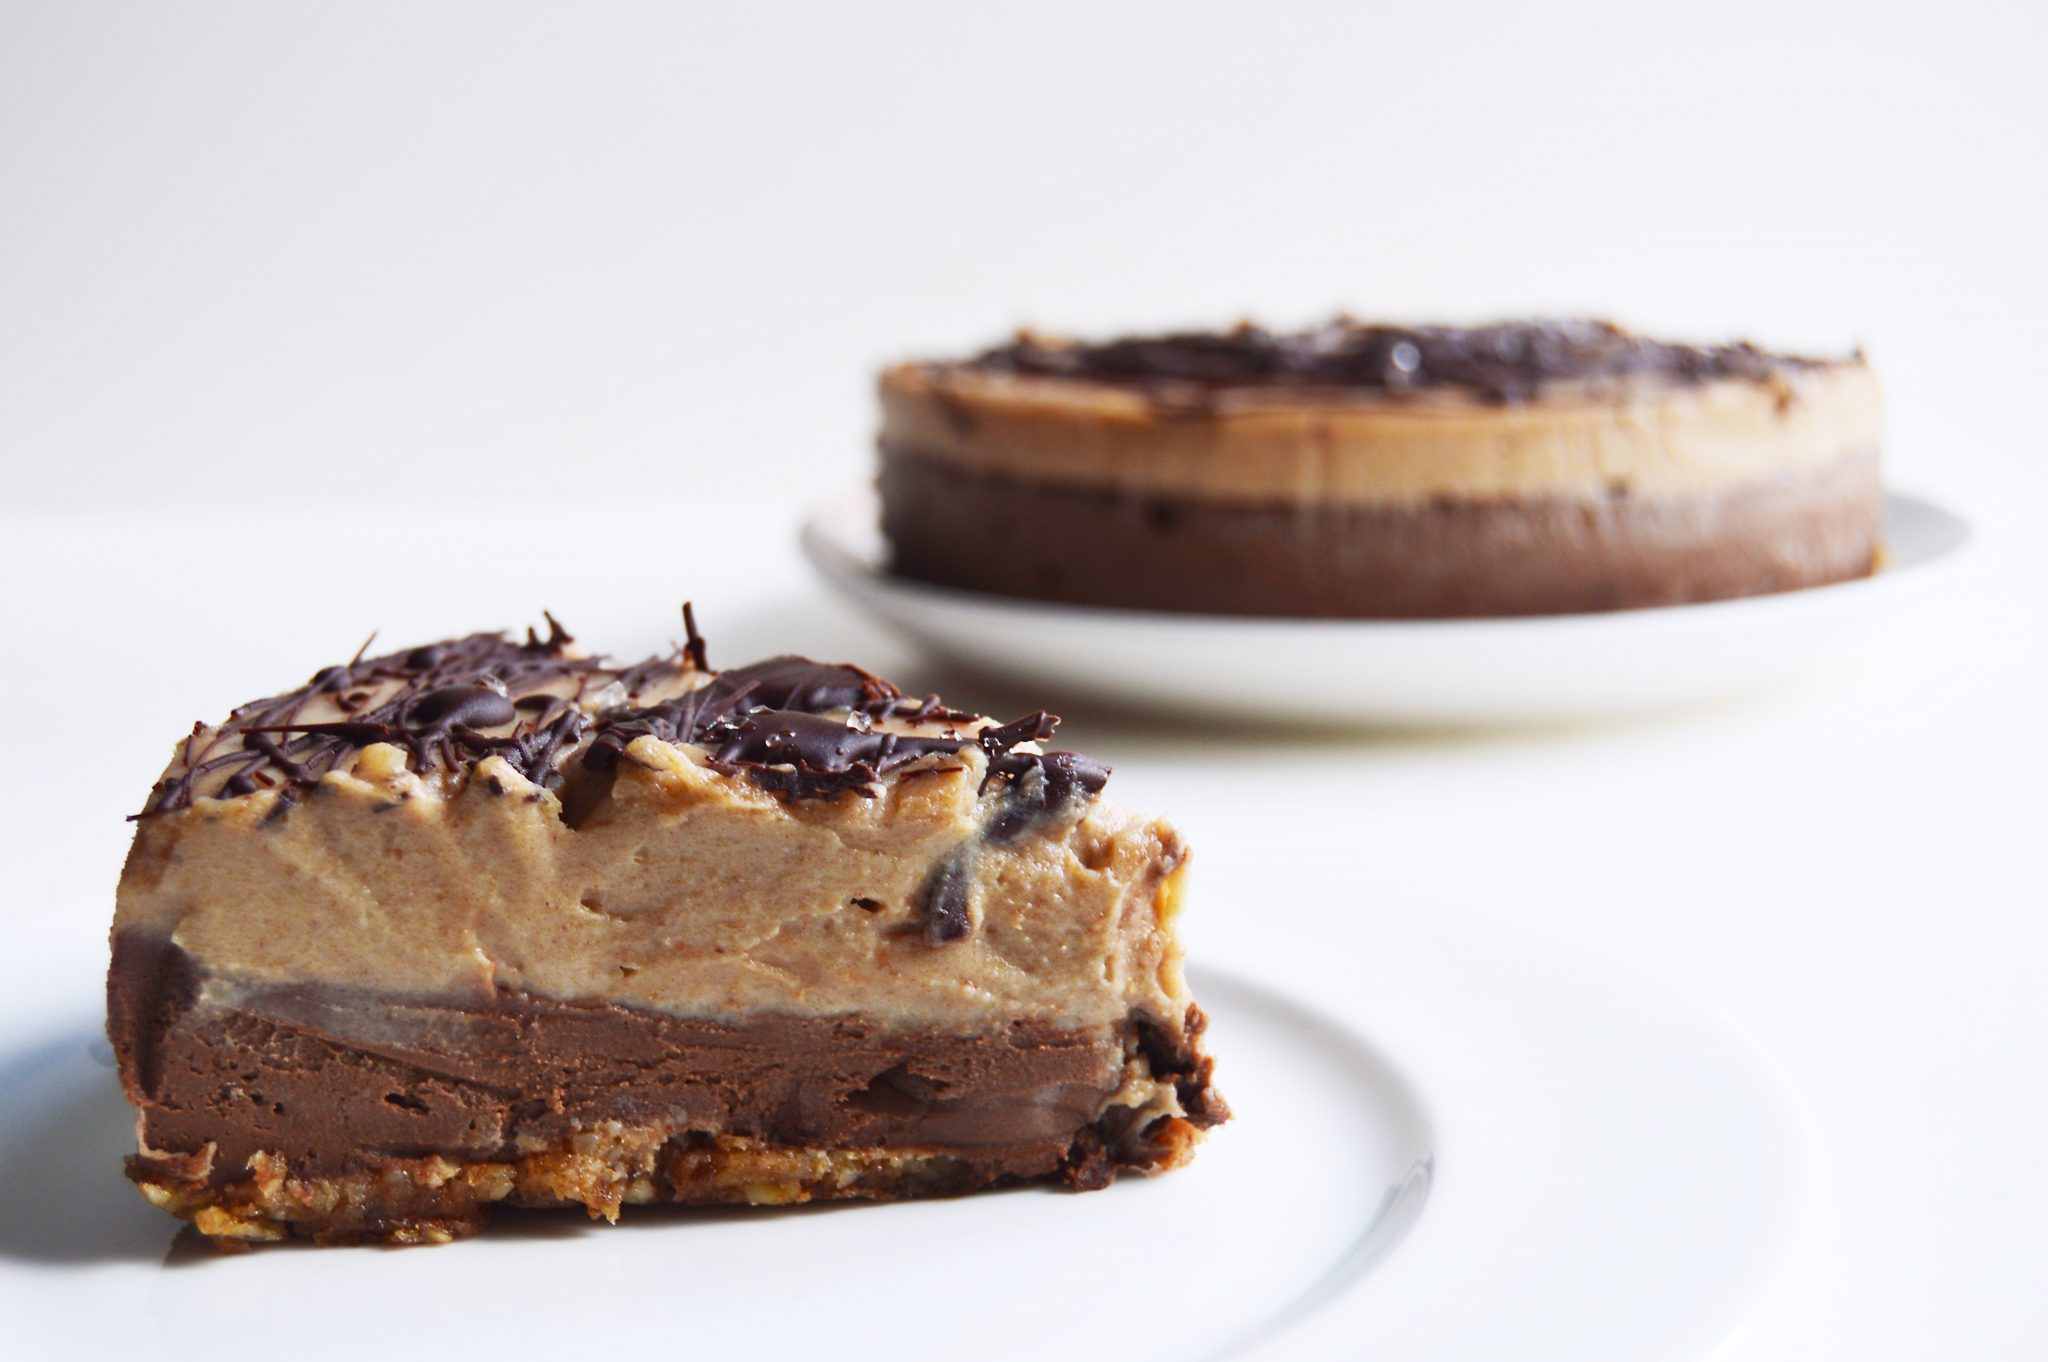 vegan-chocolate-salted-caramel-cheesecake-12